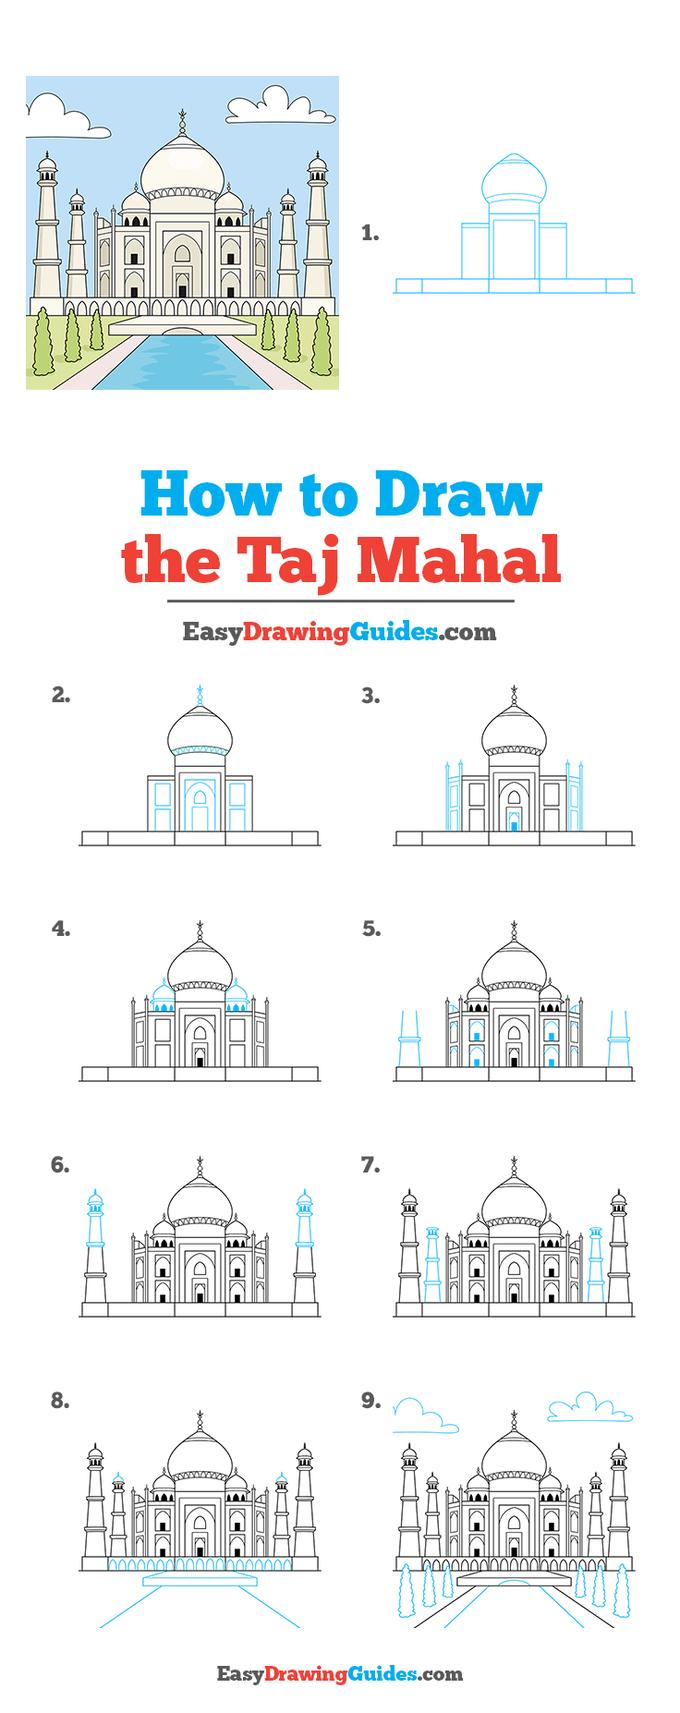 how to draw the taj mahal step by step tutorial image